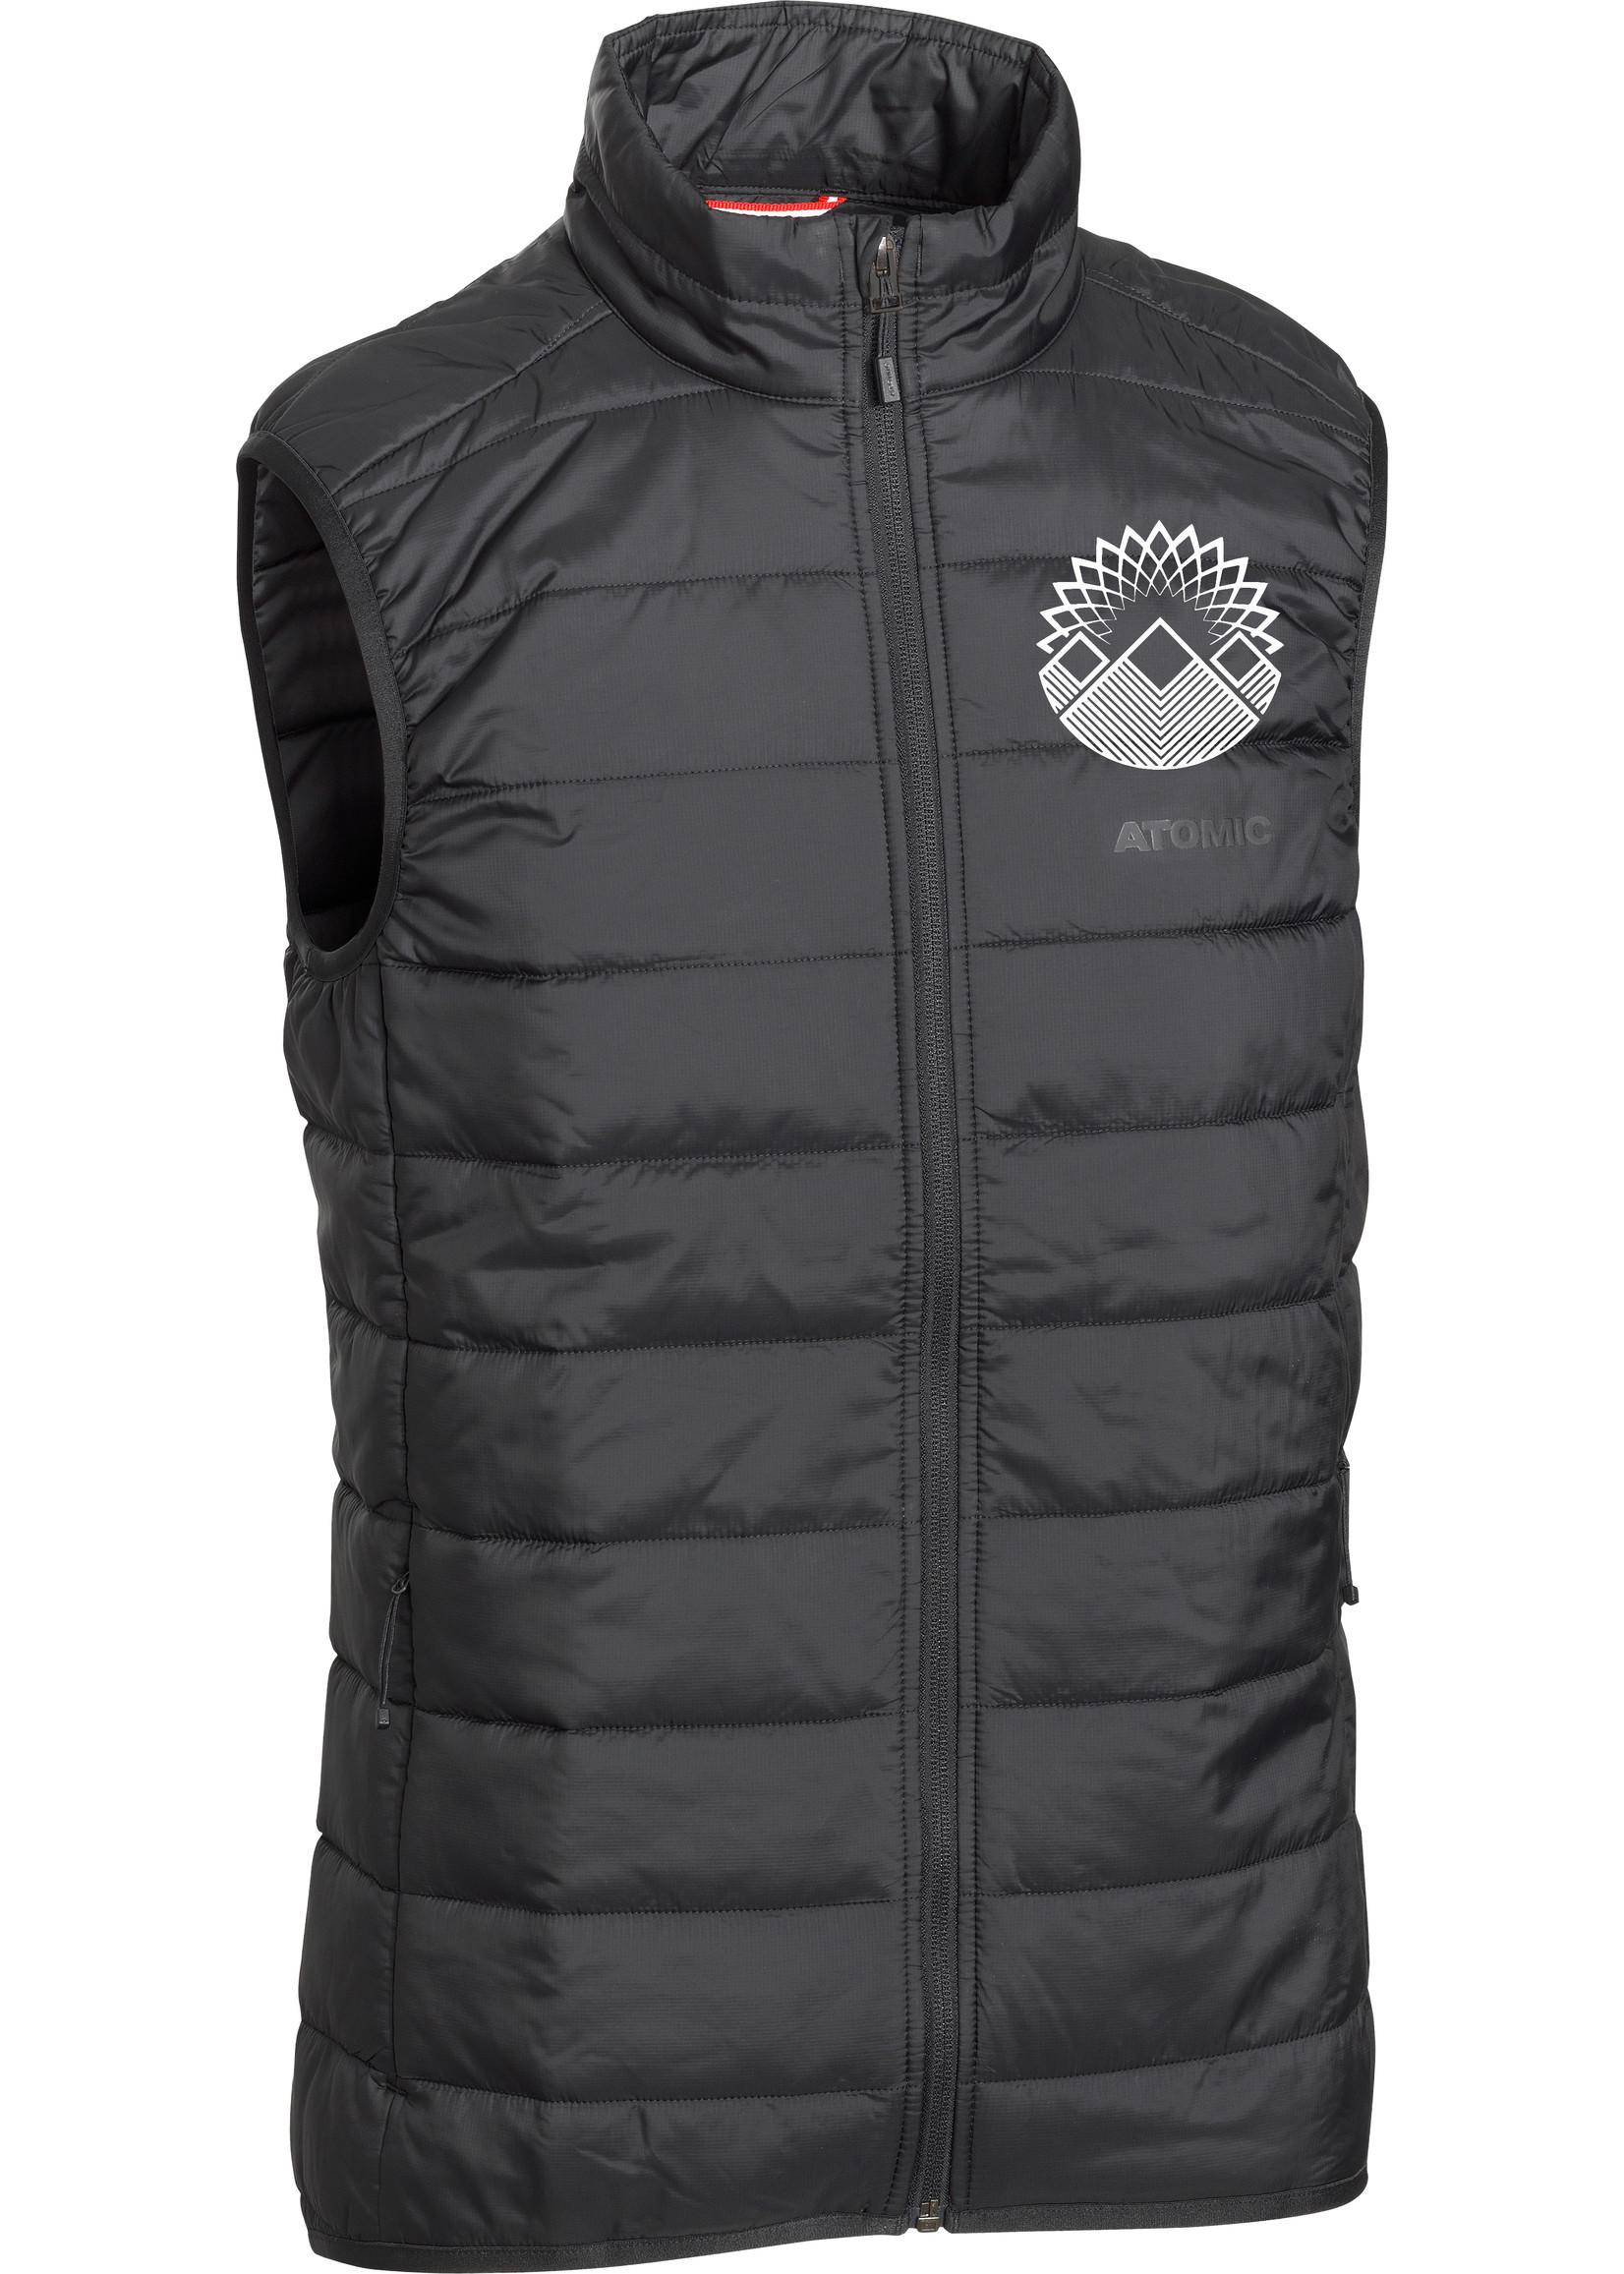 Atomic McSporties Team Vest